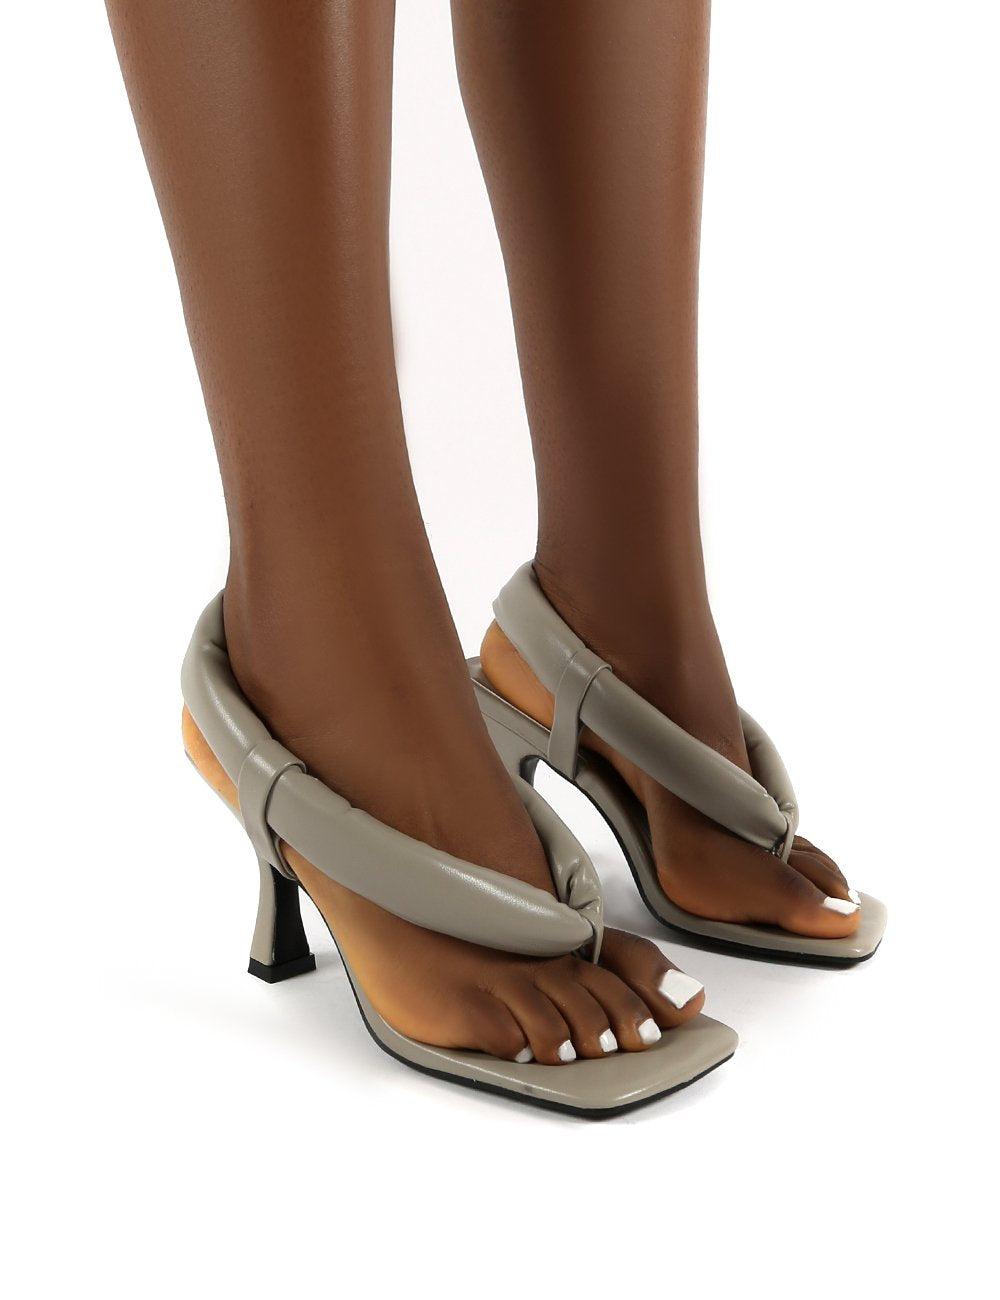 Public Desire US Alina Grey PU Square Toe Padded Toe Thong Heels - US 7